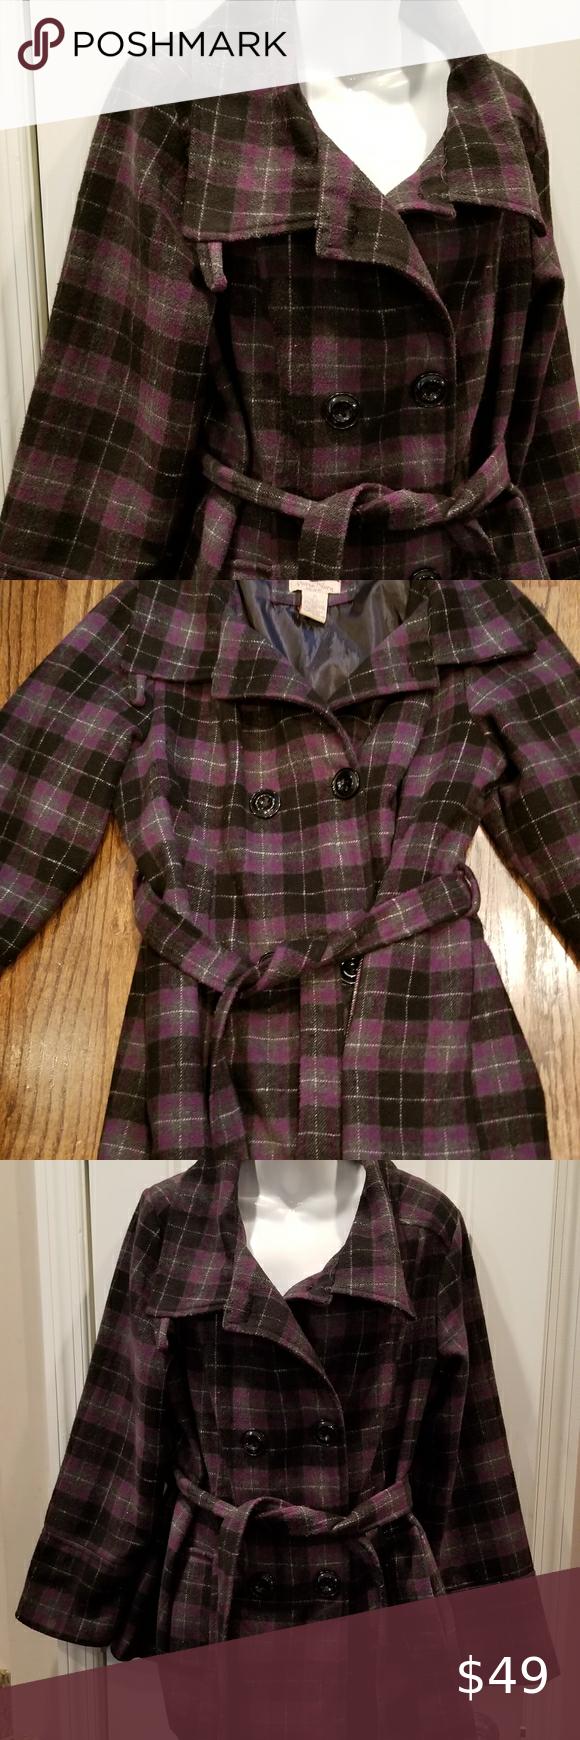 Paris Blues Wool Purple Black Plaid Coat Sz 1x Paris Blues Wool Blend Purple And Black Plaid Coat Sz 1x In Good Pre Plaid Coat Blue Outerwear Black Wool Blazer [ 1740 x 580 Pixel ]